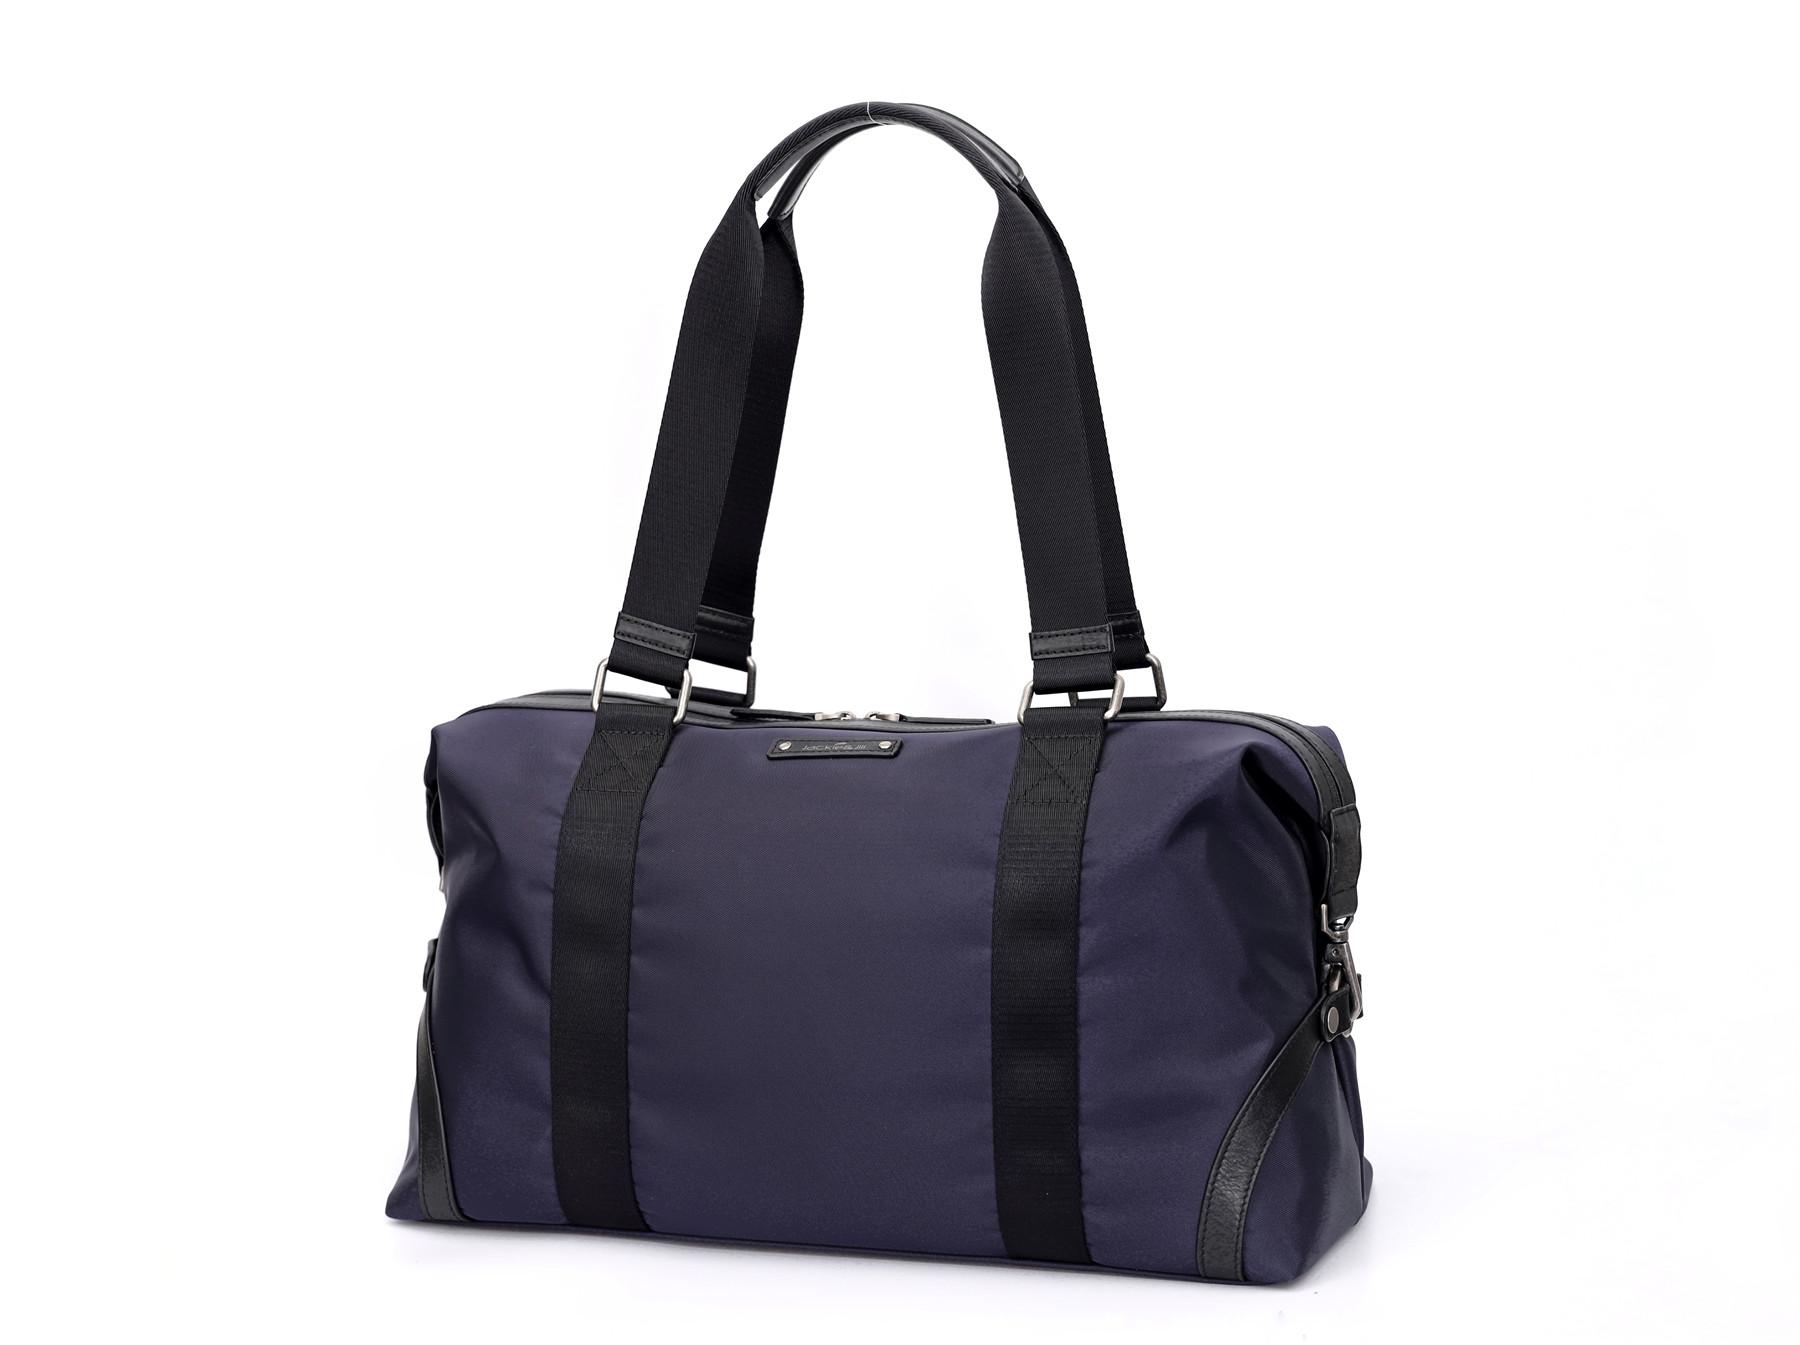 GF bags-Oem Mens Overnight Bag Manufacturer   Duffle-4